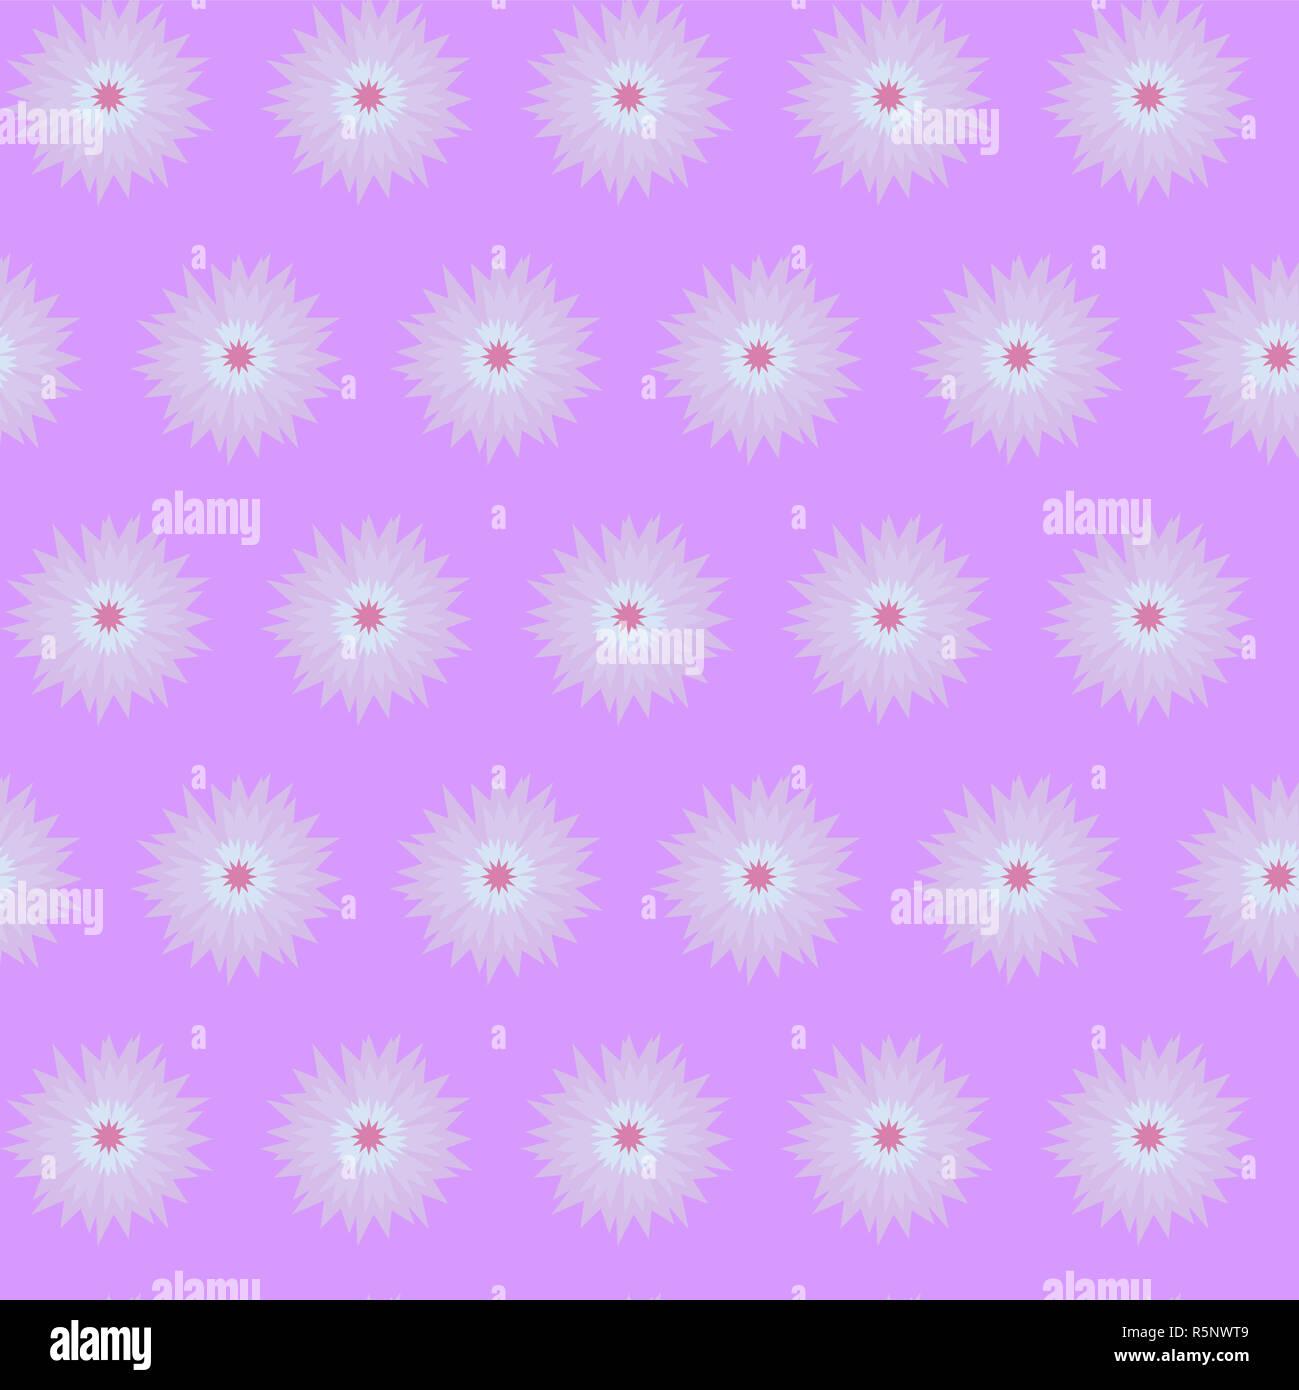 Violet Purple Flower Cornflower Isolated On White Background Cartoon Vector Centaurea Cyanus Illustration Stock Photo Alamy